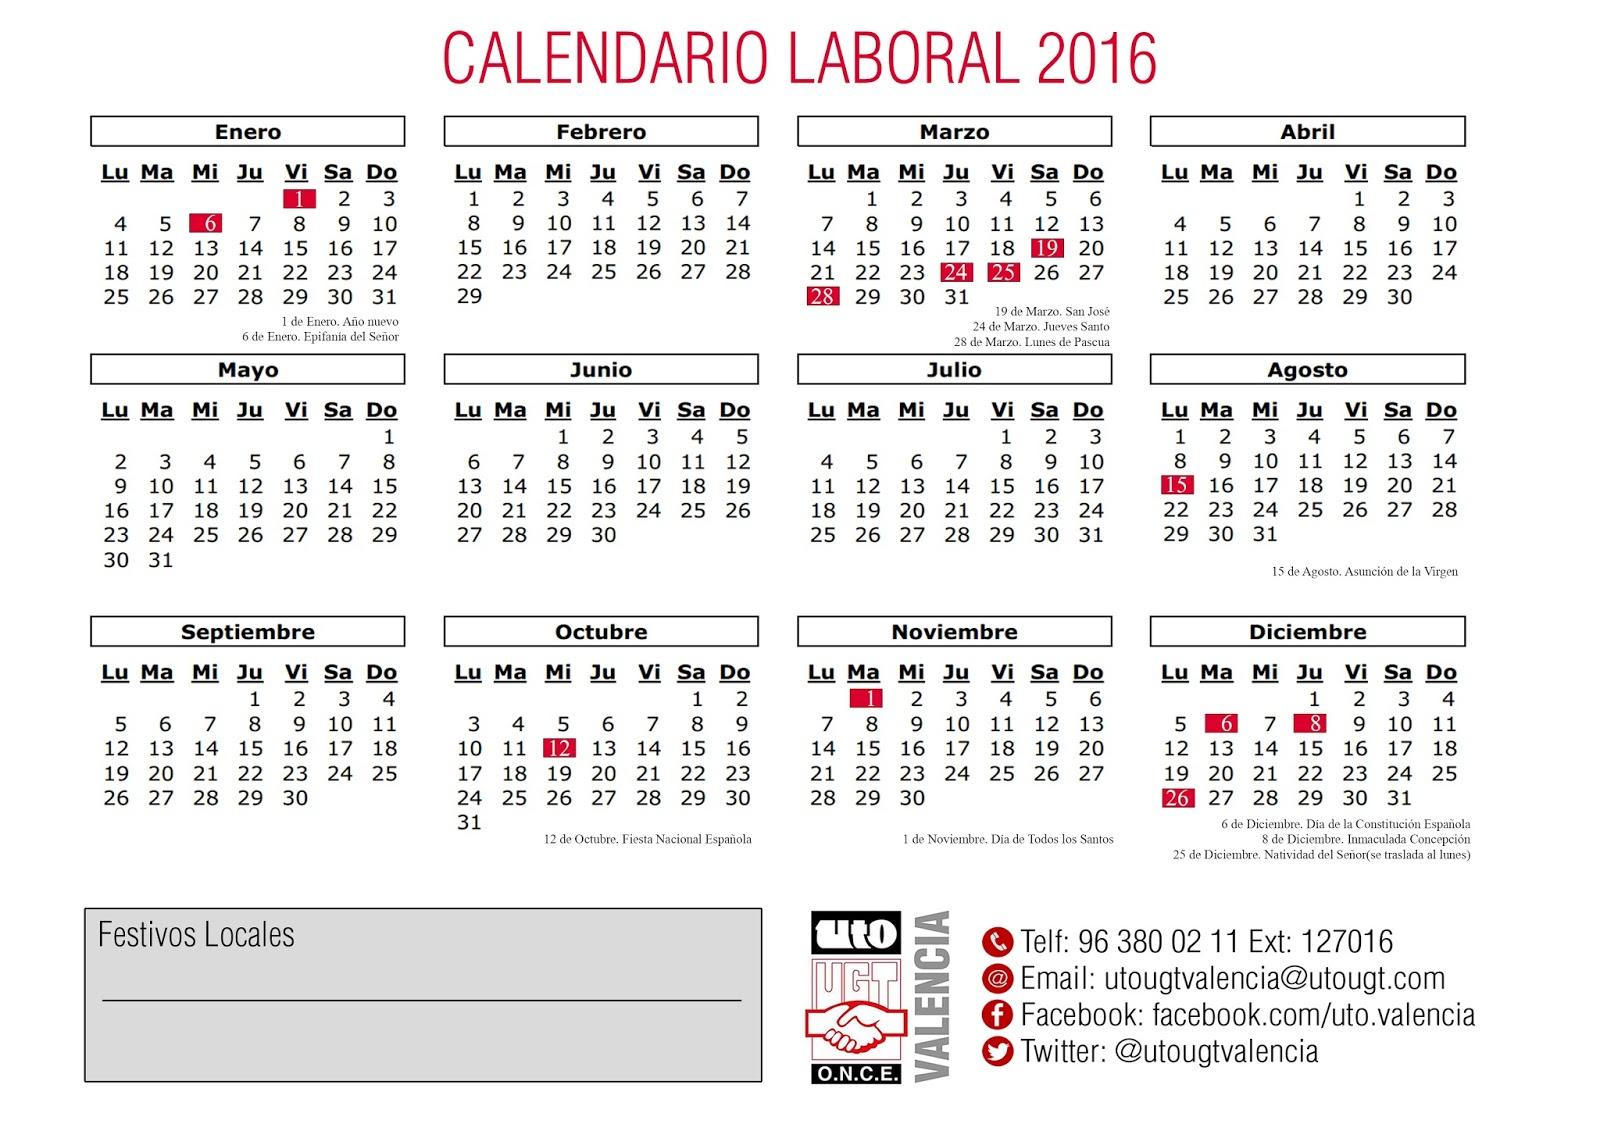 Calendario Laboral De Valencia.Uto Ugt Valencia Calendario Laboral Comunidad Valenciana 2016